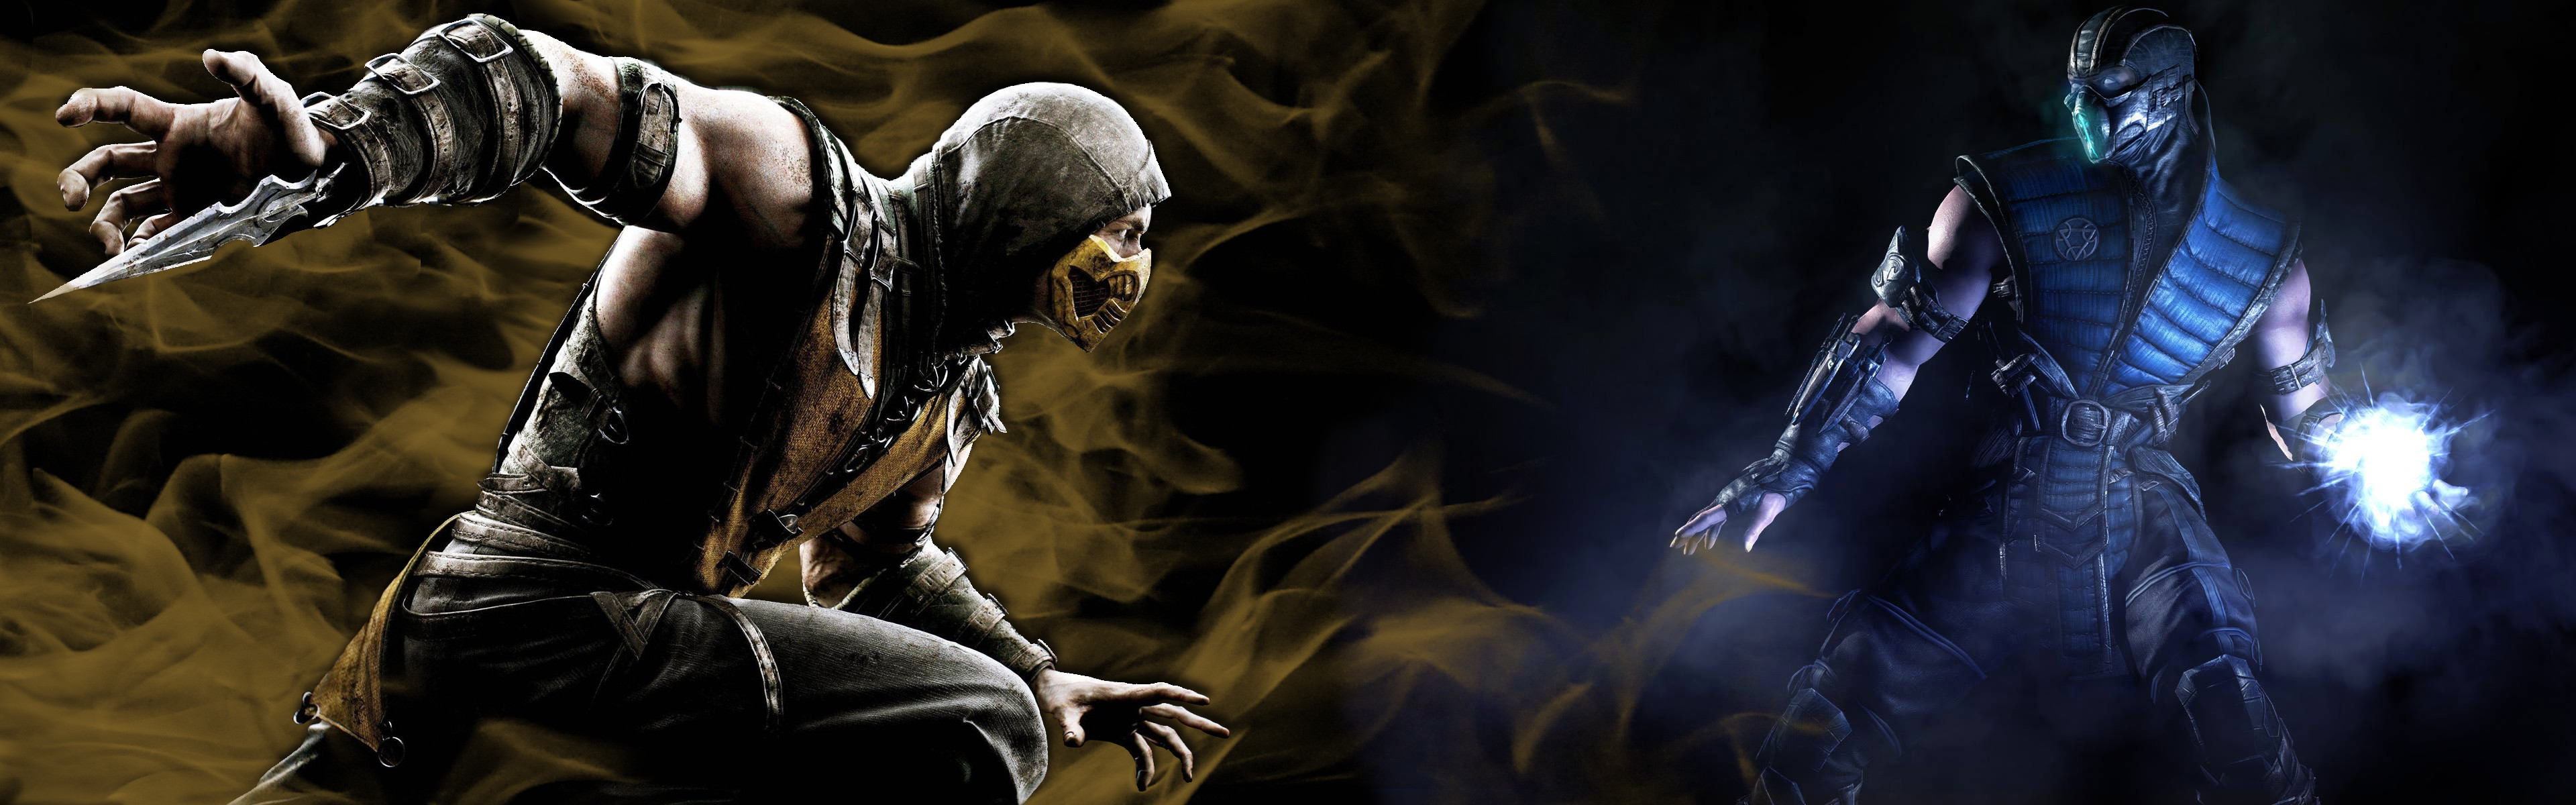 mortal kombat 9 scorpion wallpaper (72+ images)